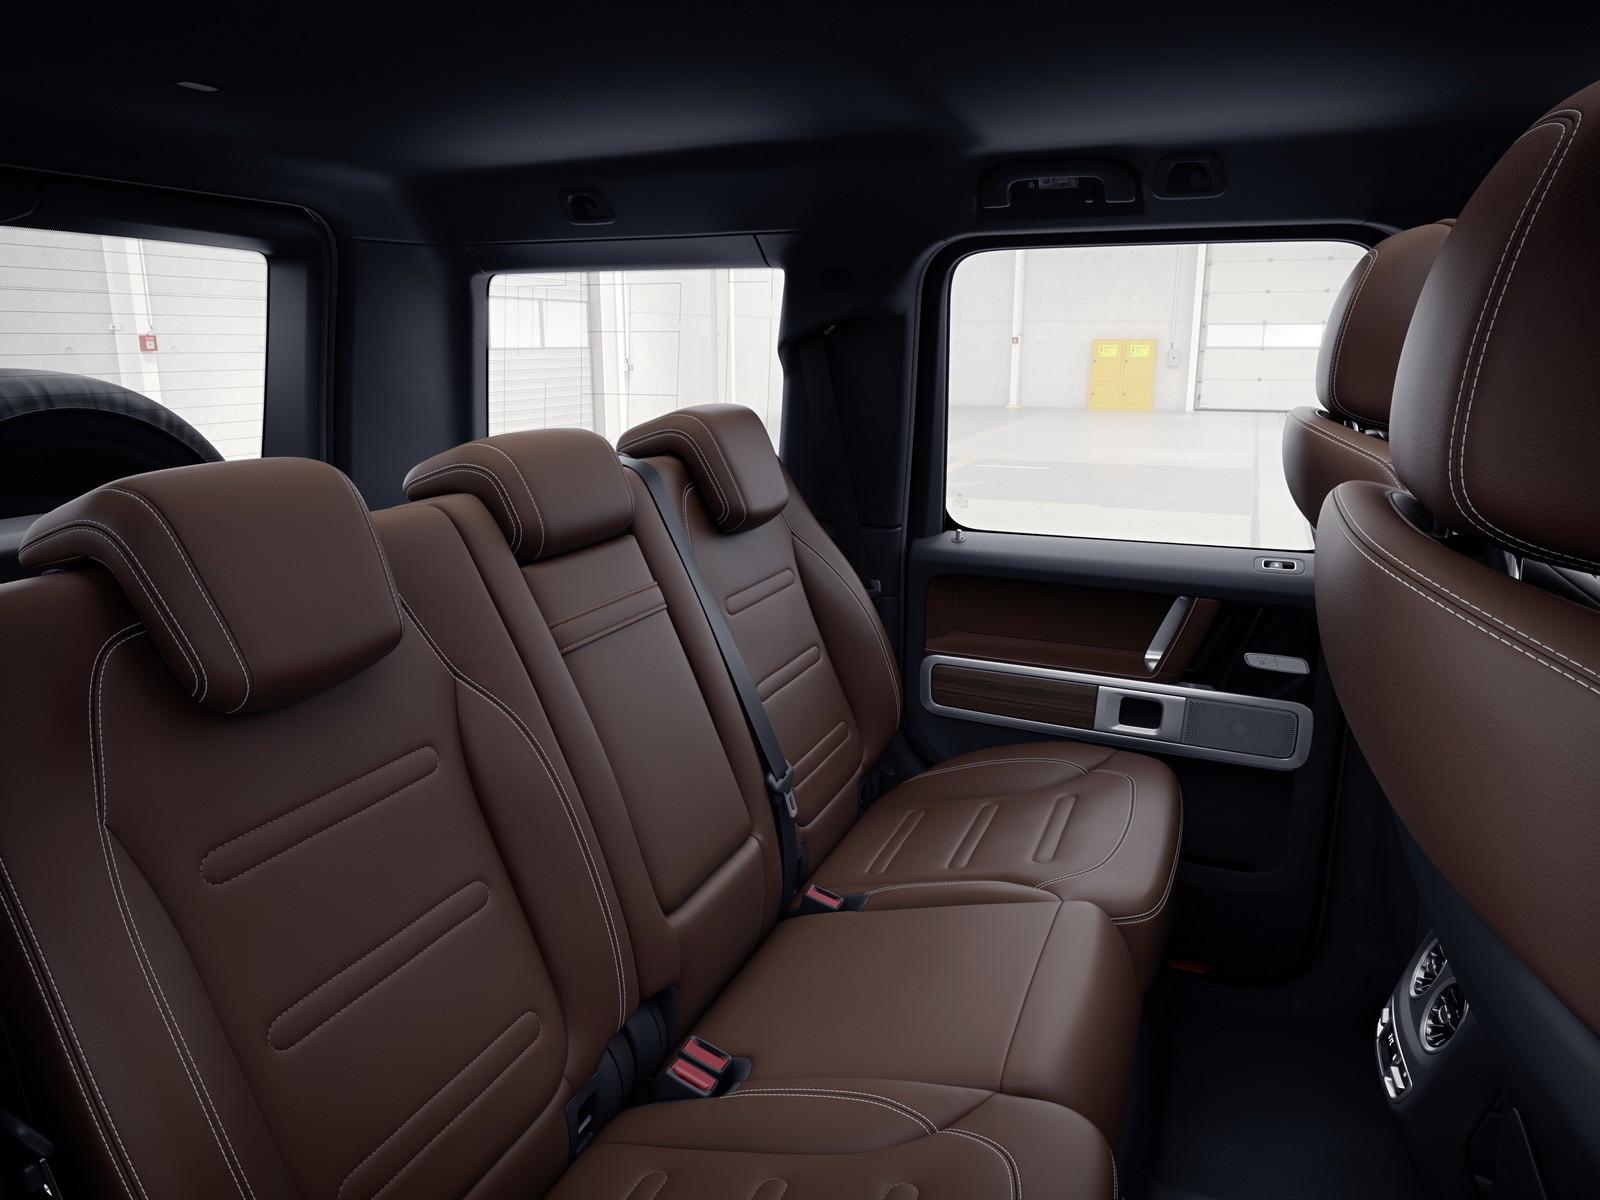 Foto de Mercedes-Benz Clase G 2018, imágenes filtradas (8/24)